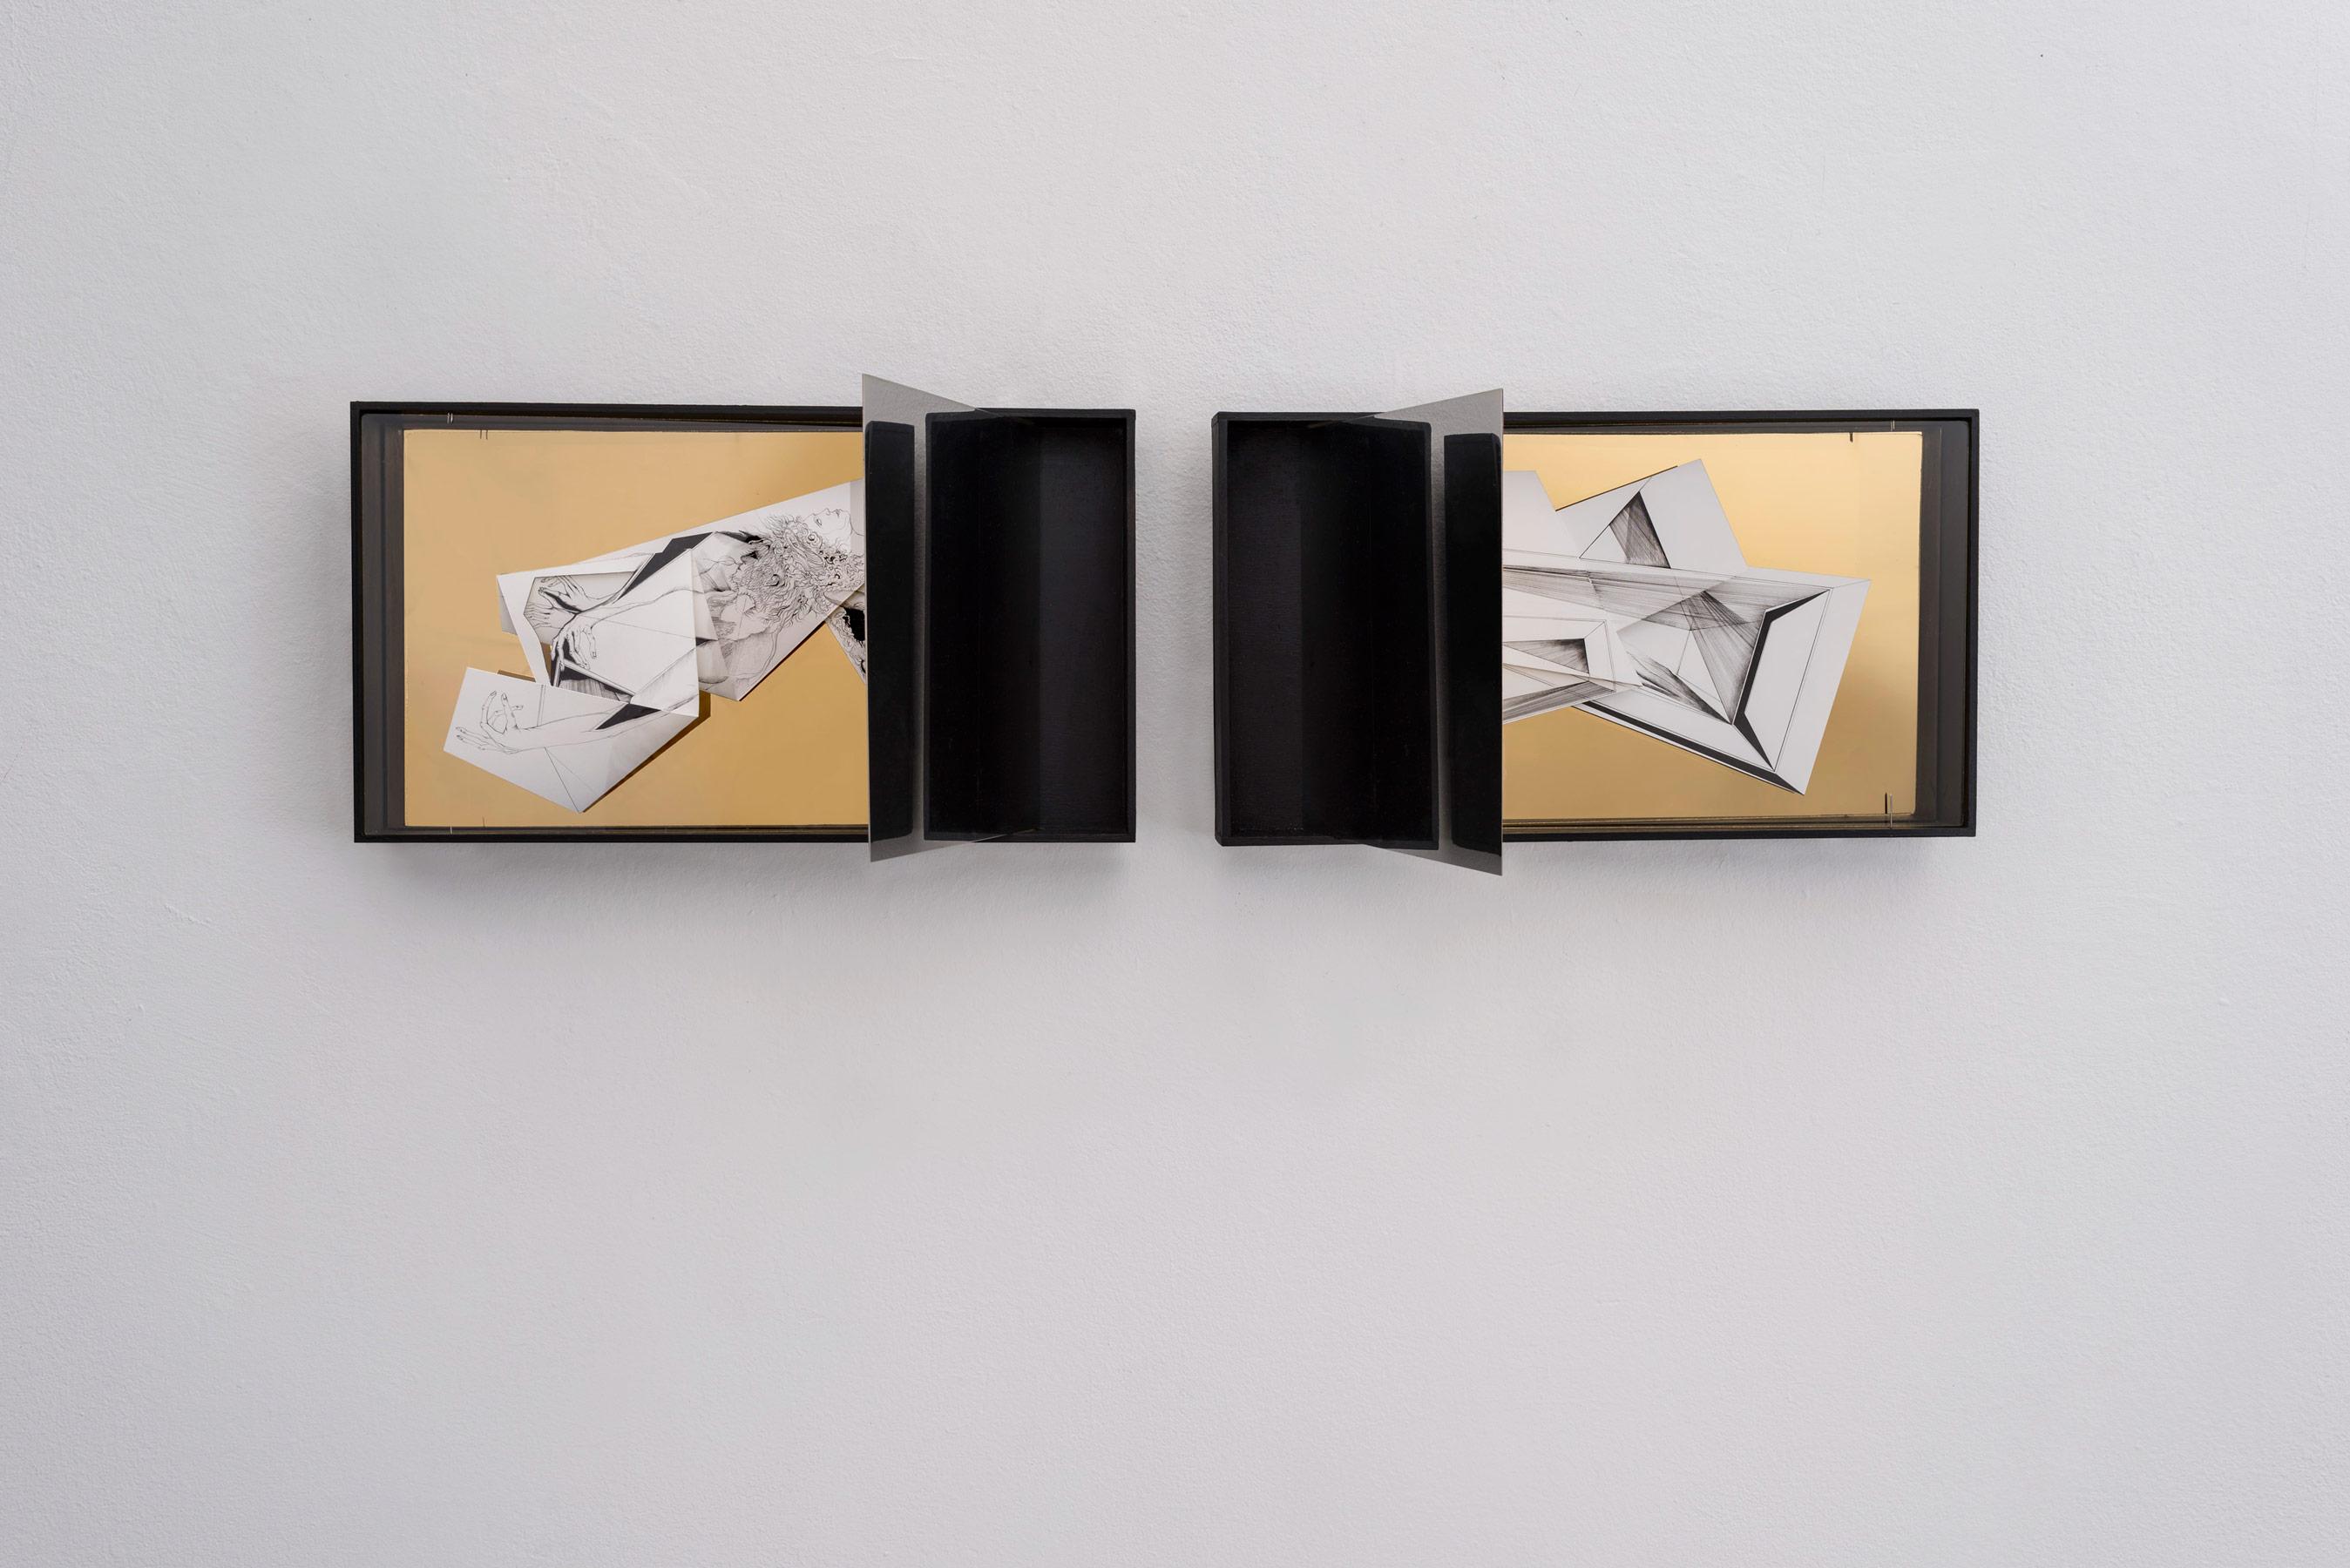 Nina Annabelle Märkl   Space 6.1., 6.2.   Ink on folded paper, cutouts, polished steel   30 x 100 x 25 cm   2017